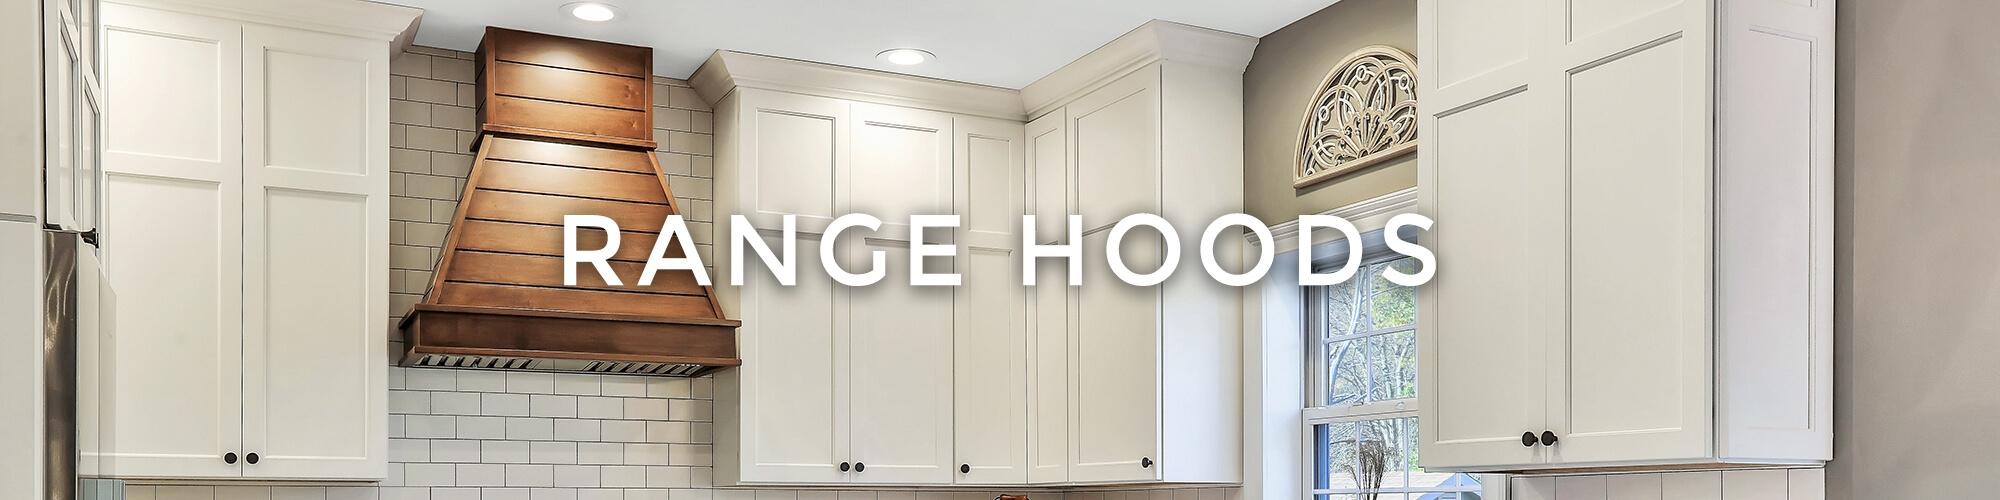 Wood Range Hood Covers And Ventilators Remodel Market